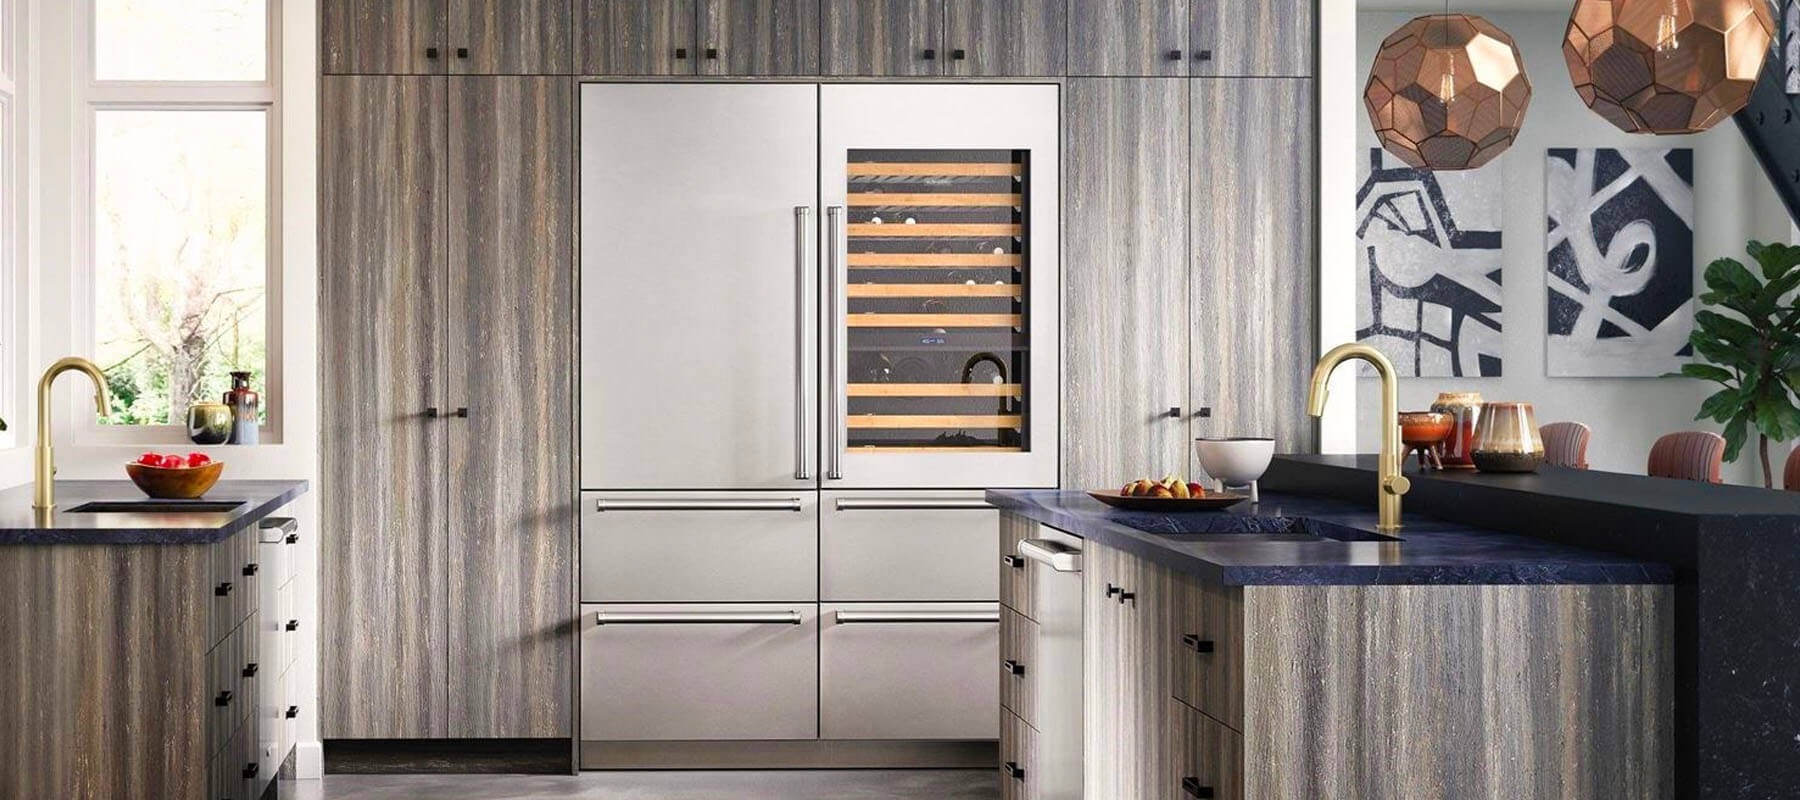 Built in Wine Refrigerator Pacific Palisades | Built-in Refrigerator Repair